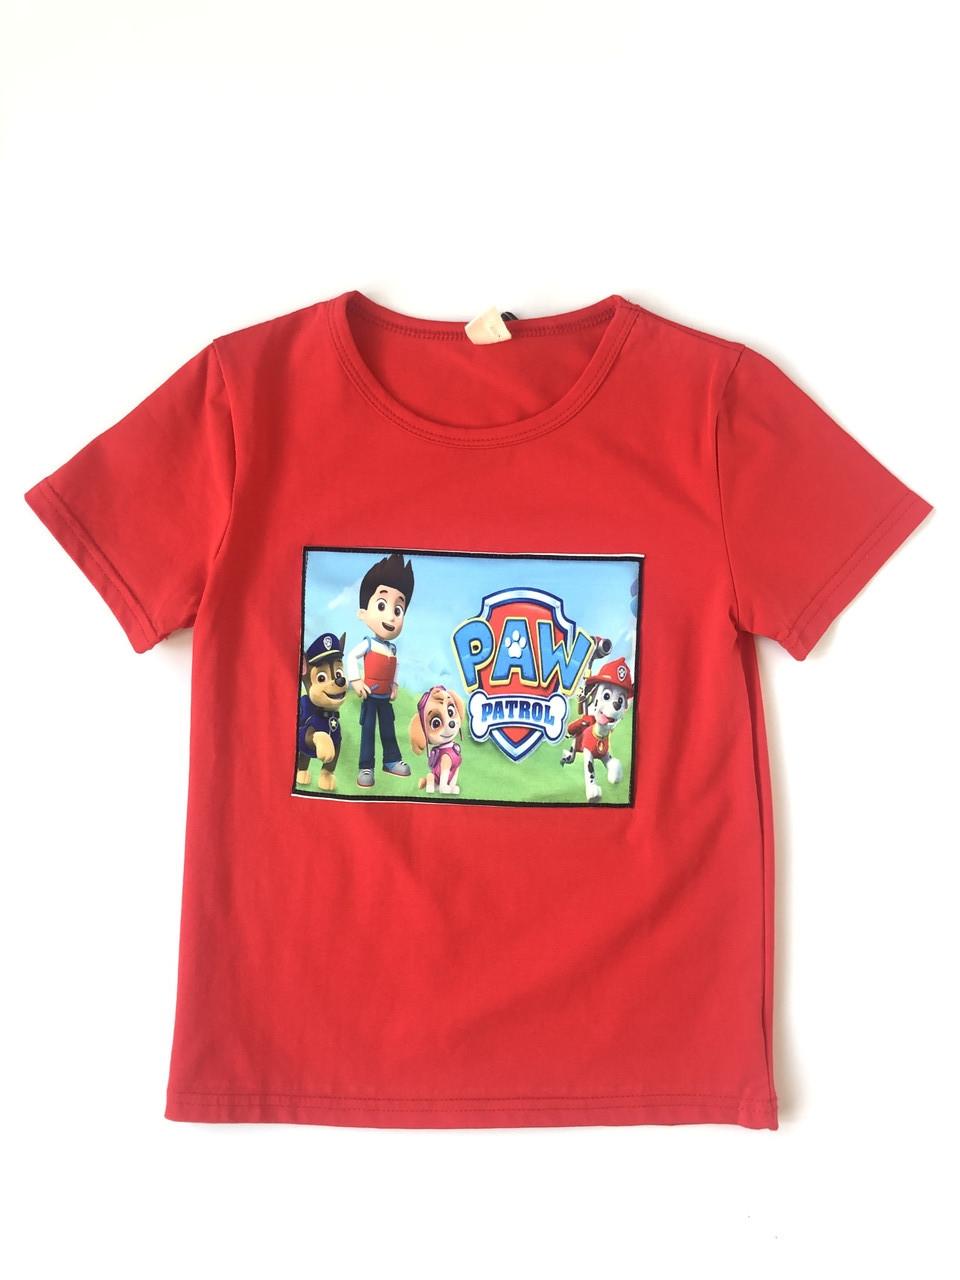 Дитяча футболка для хлопчика